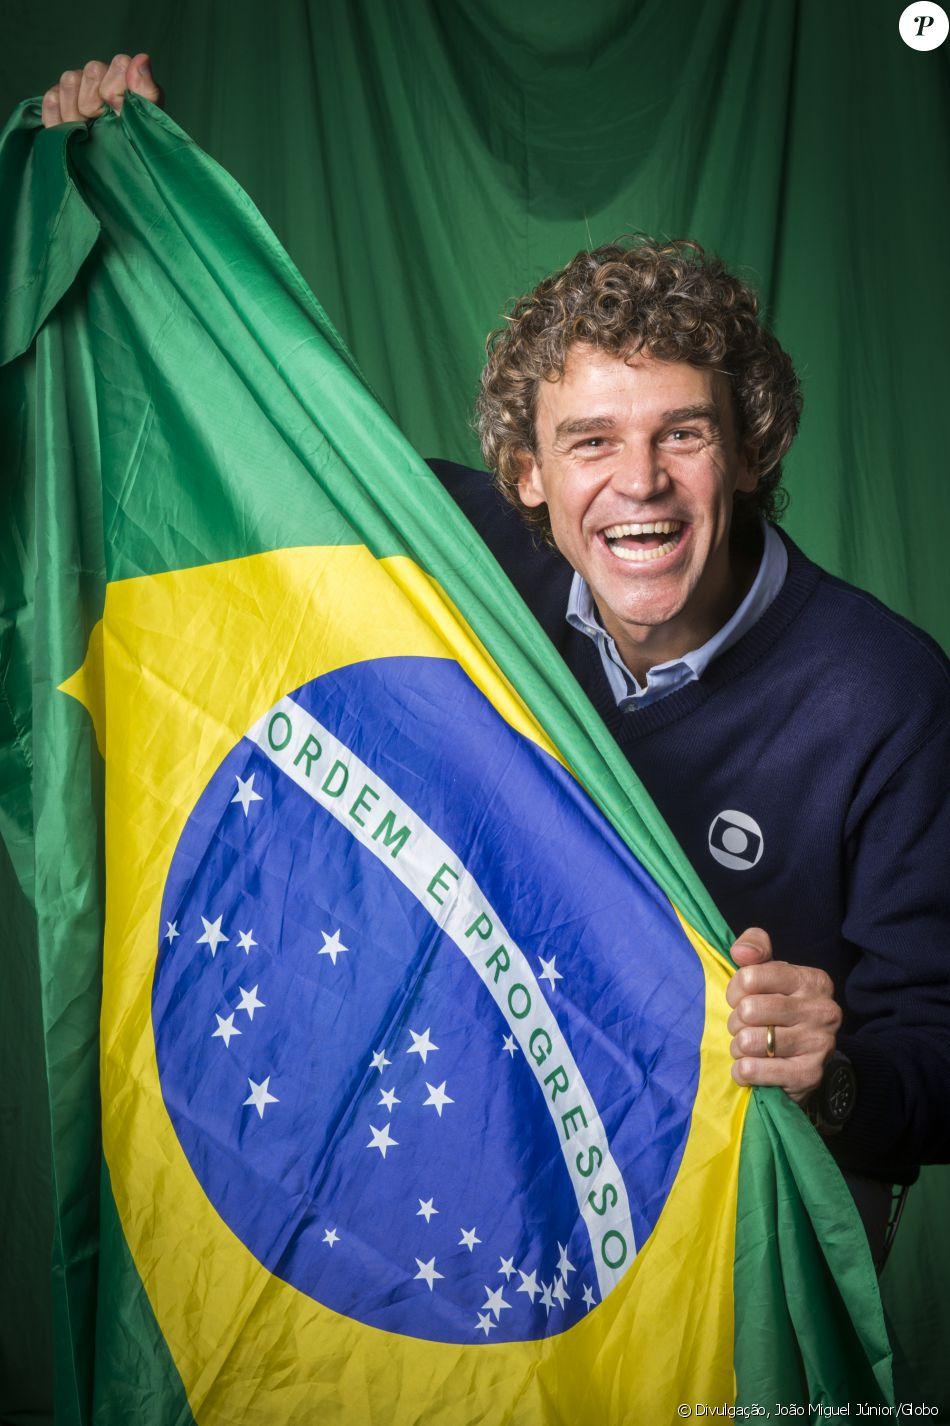 Gustavo Kuerten entarista da Globo conquistou internautas por